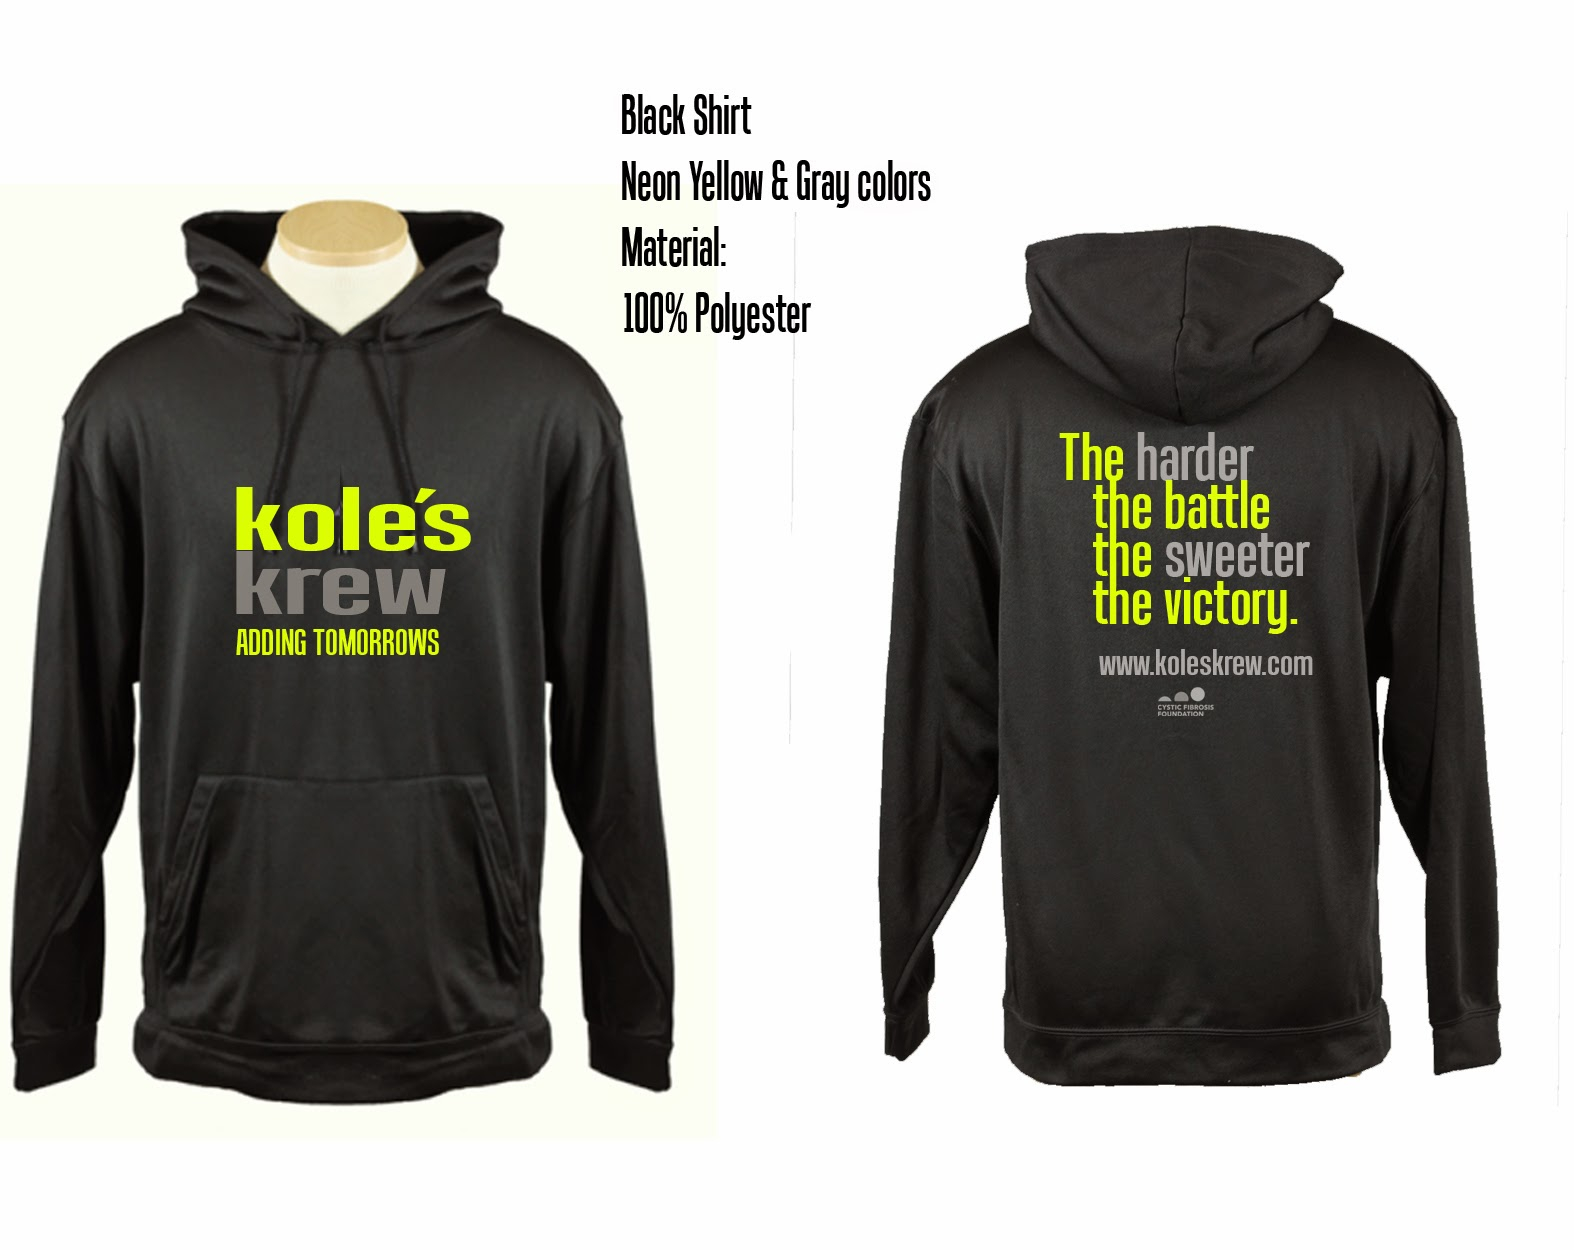 http://www.koleskrew.com/p/merchandise.html